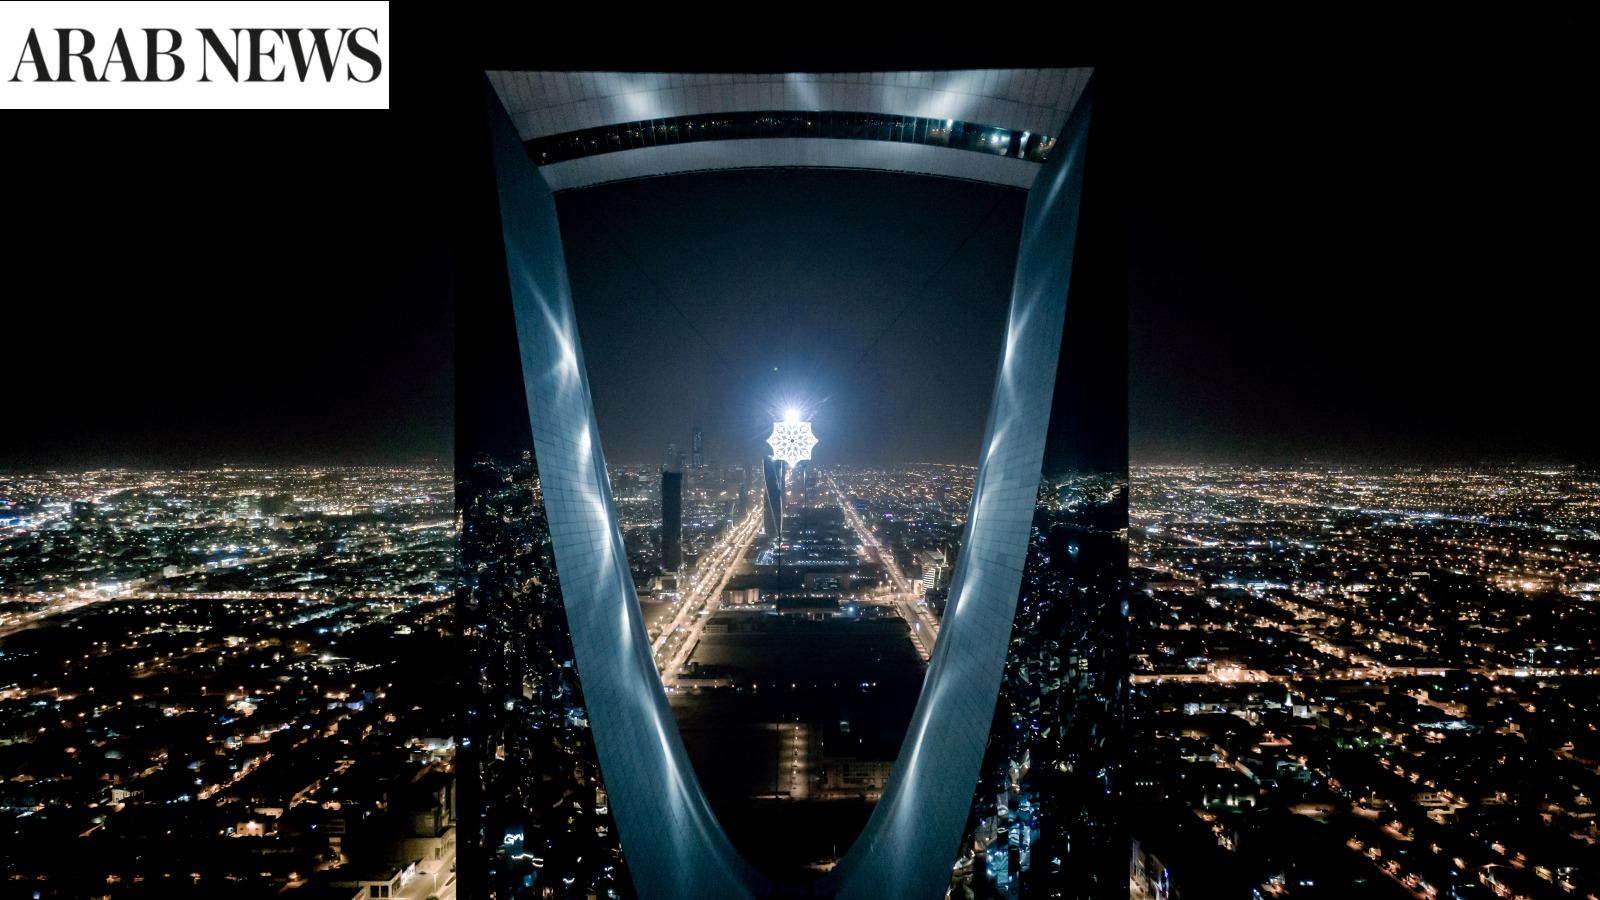 Artworks at Noor Riyadh festival set two Guinness World Records